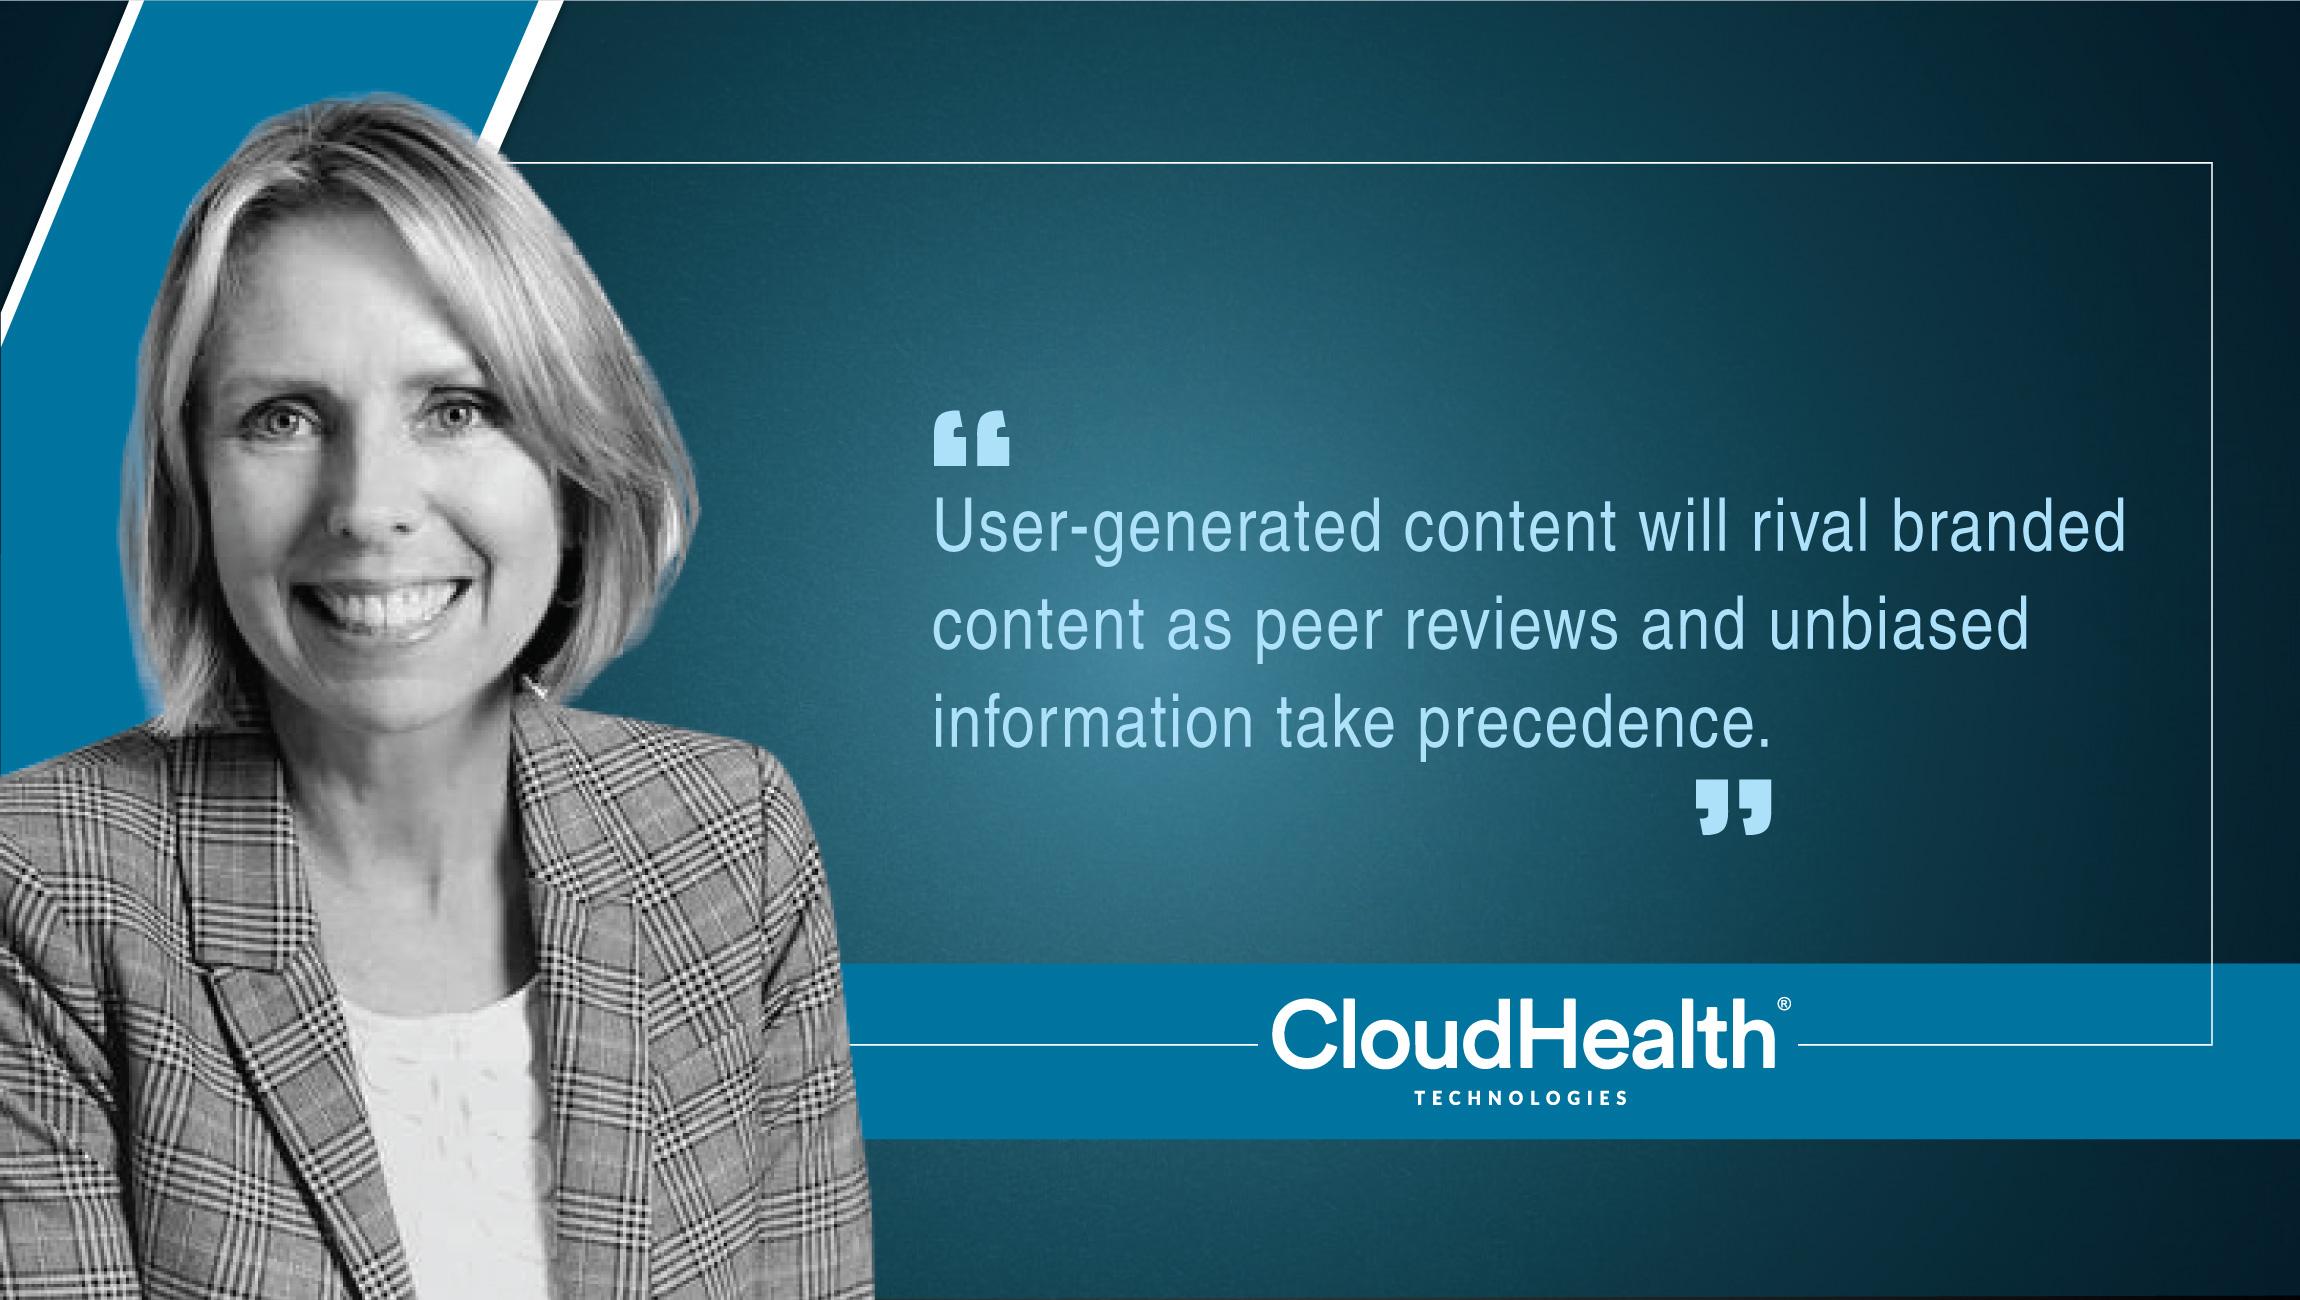 Melodye Mueller, VP Marketing & Strategic Alliances, CloudHealth Technologies